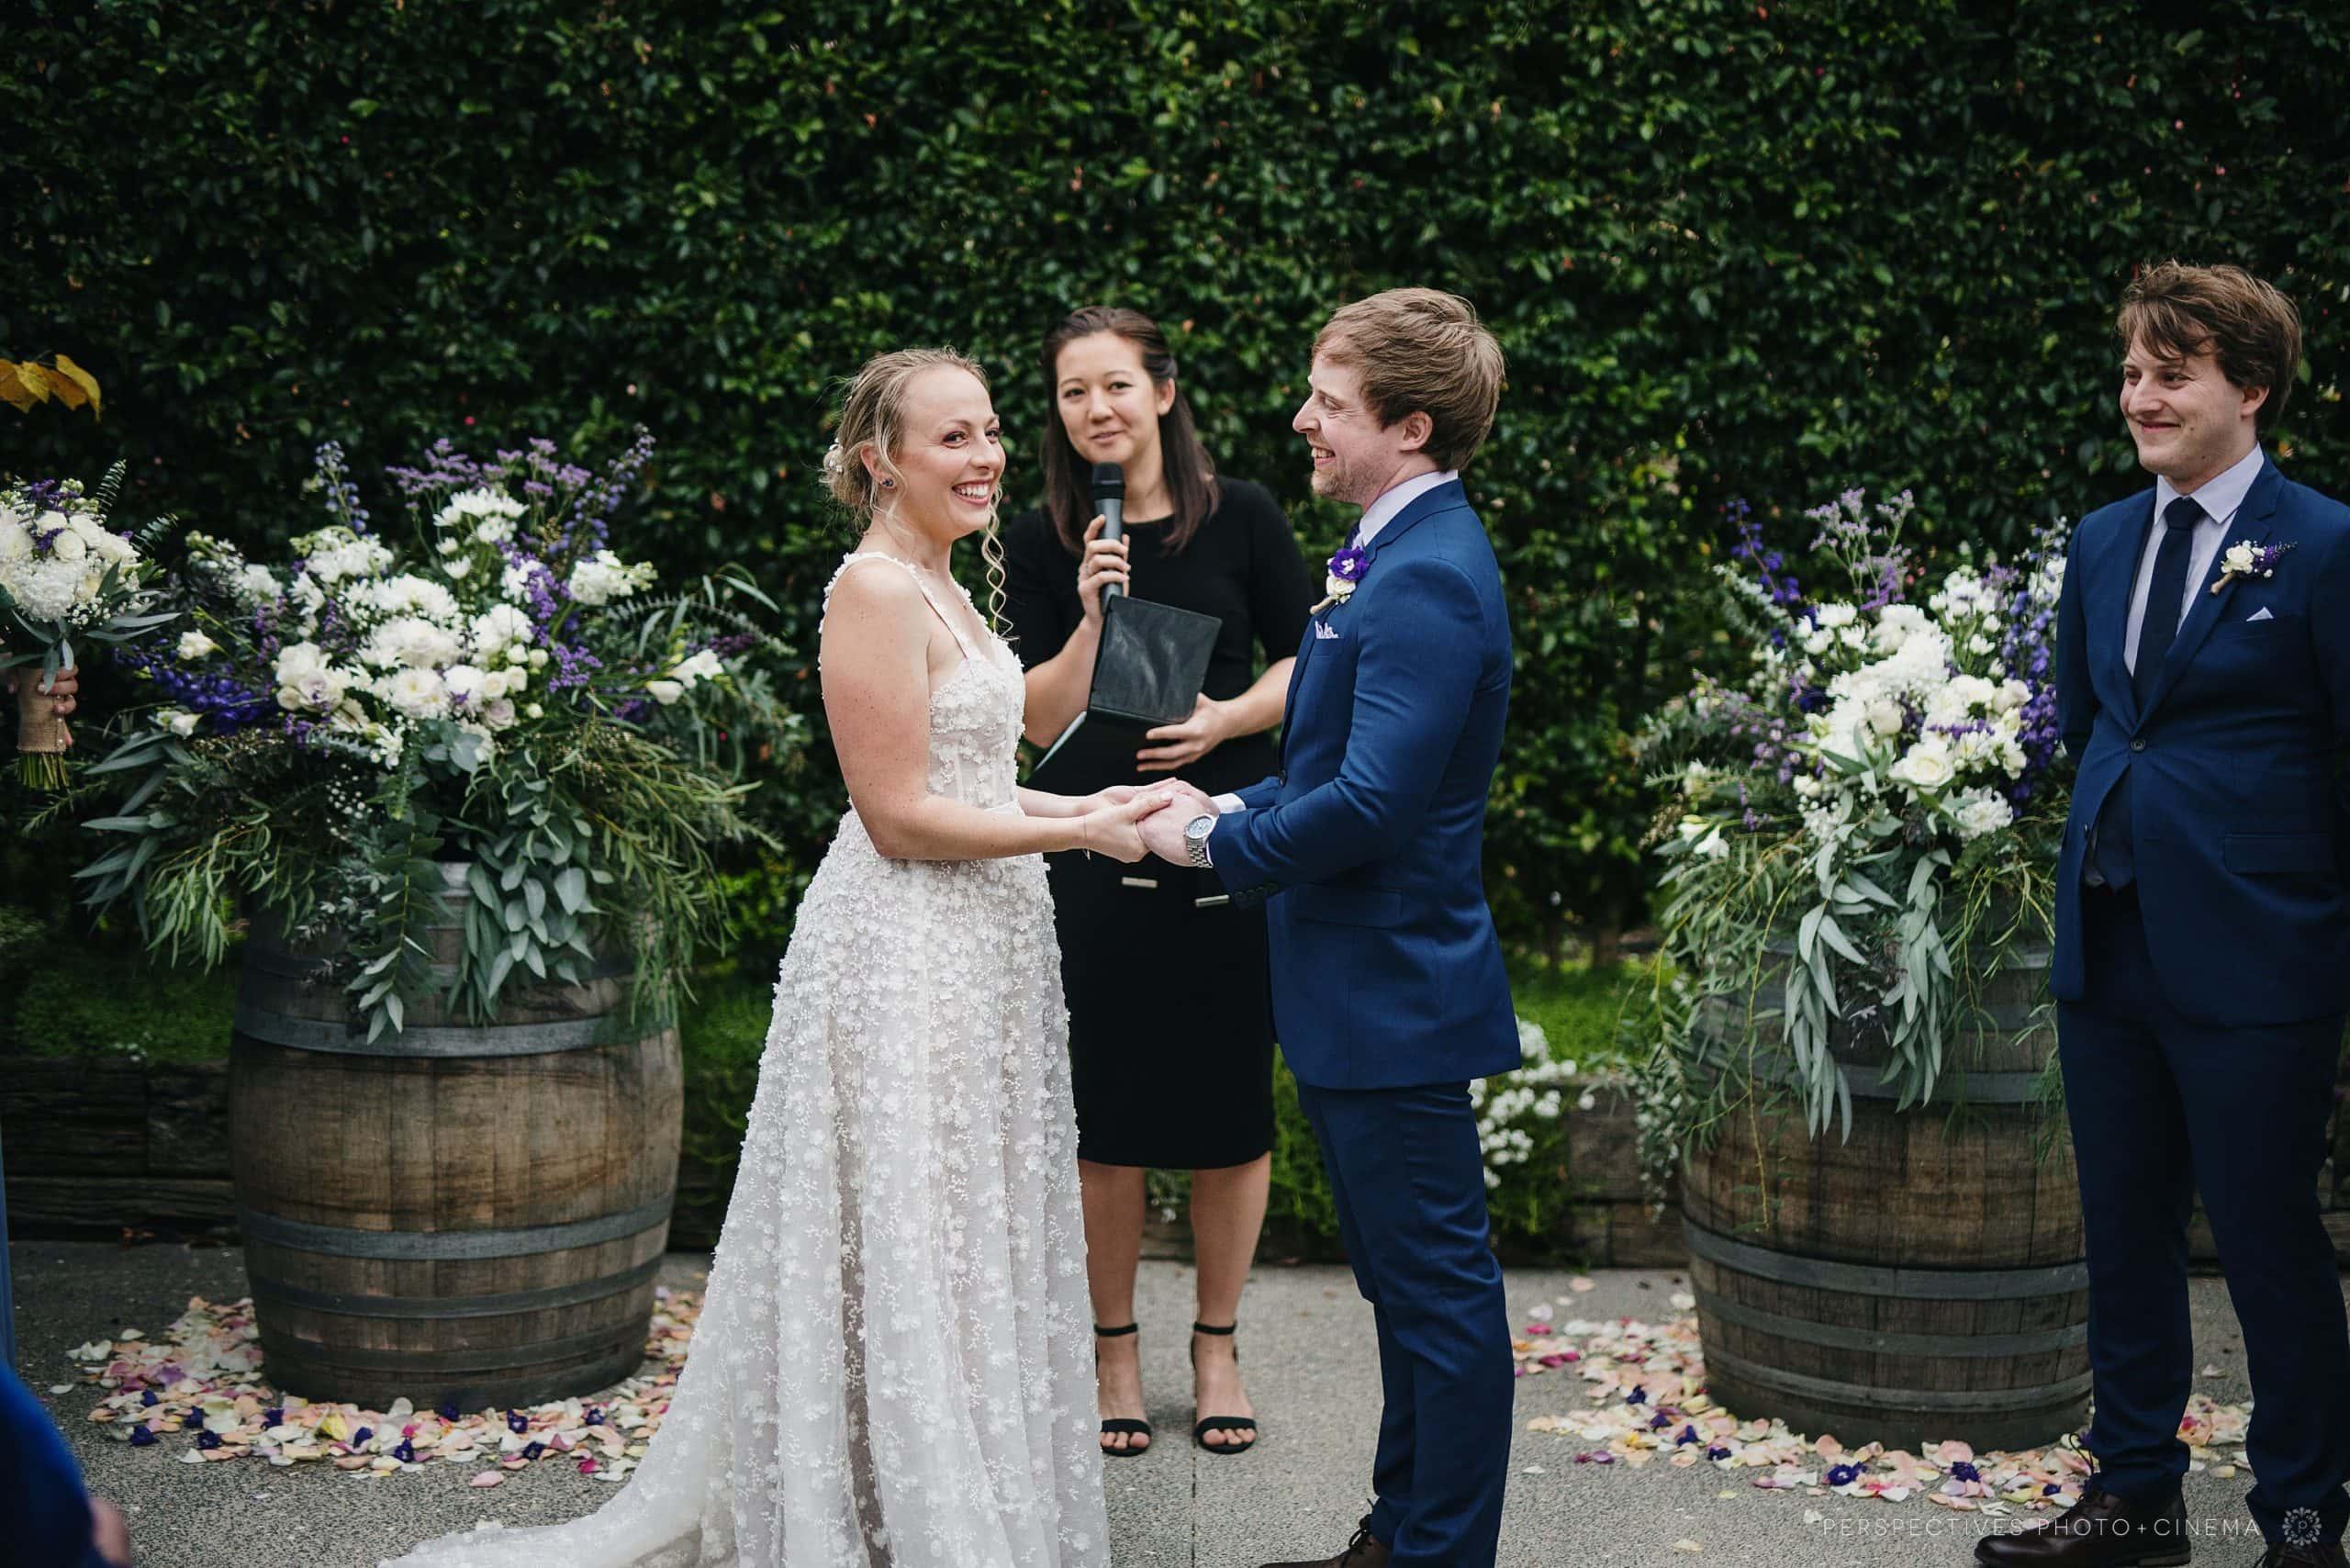 Mudbrick lodge wedding